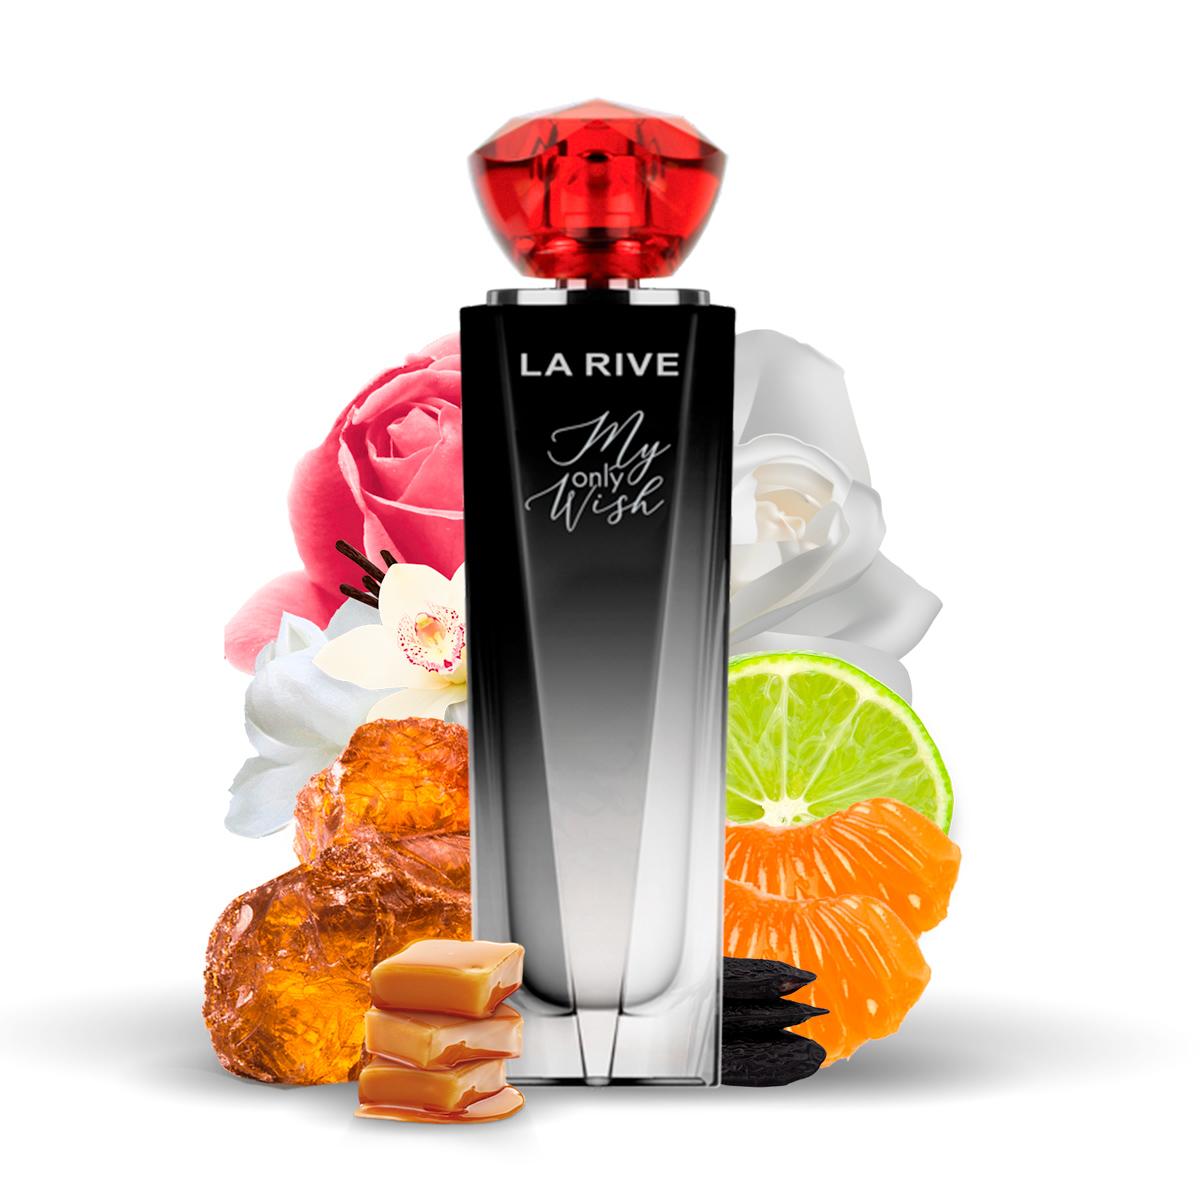 Kit 2 Perfumes Importados My Only Wish e Brave La Rive